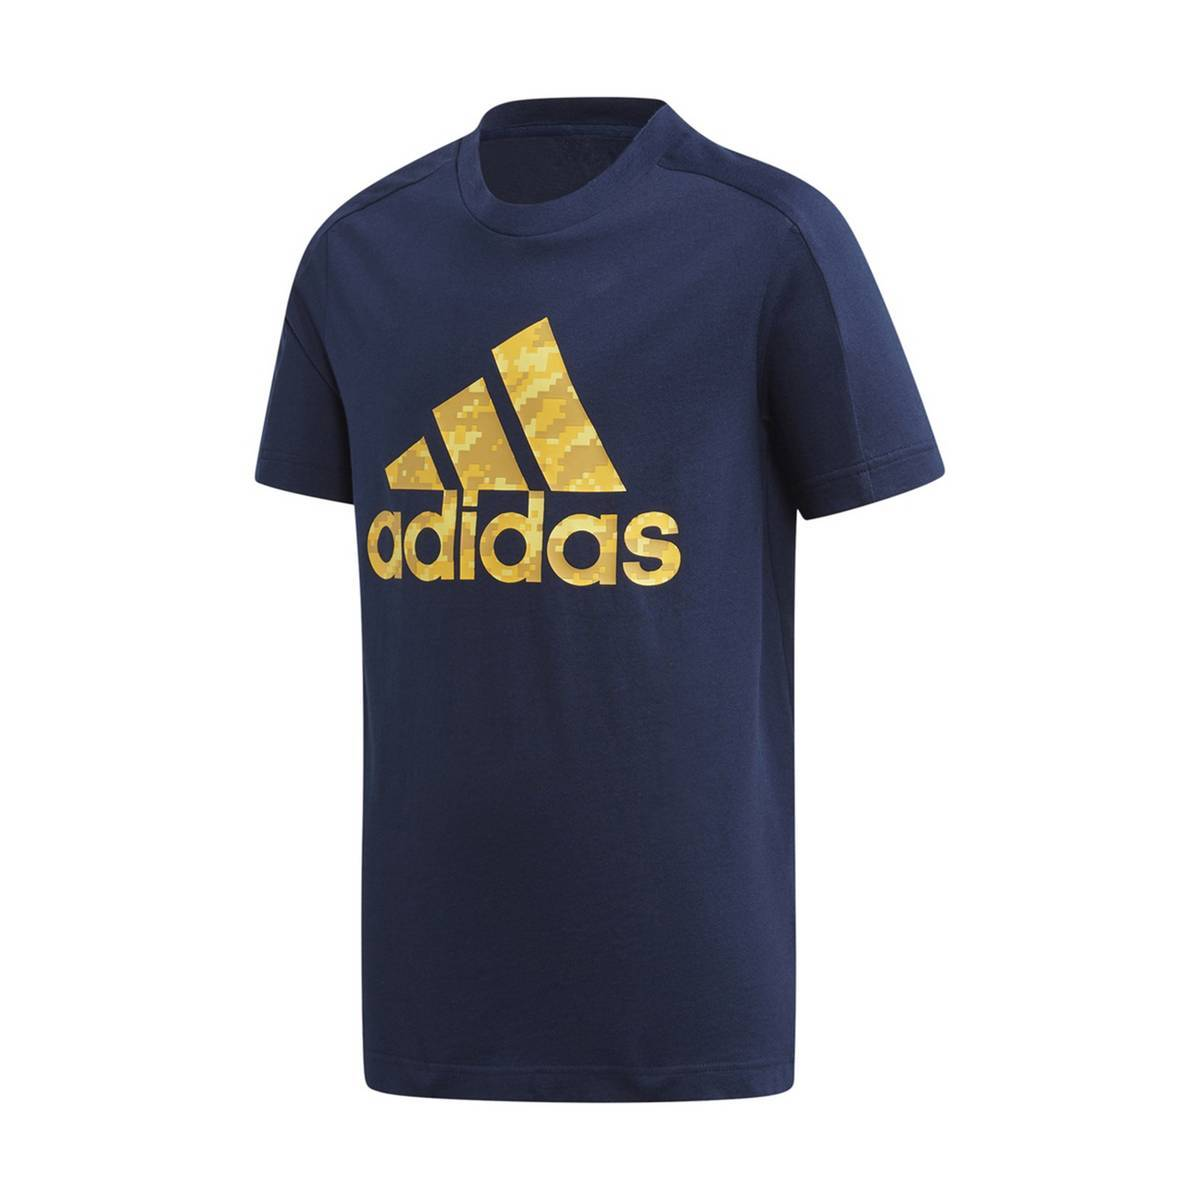 adidas Performance T-shirt 7 - 16 ans